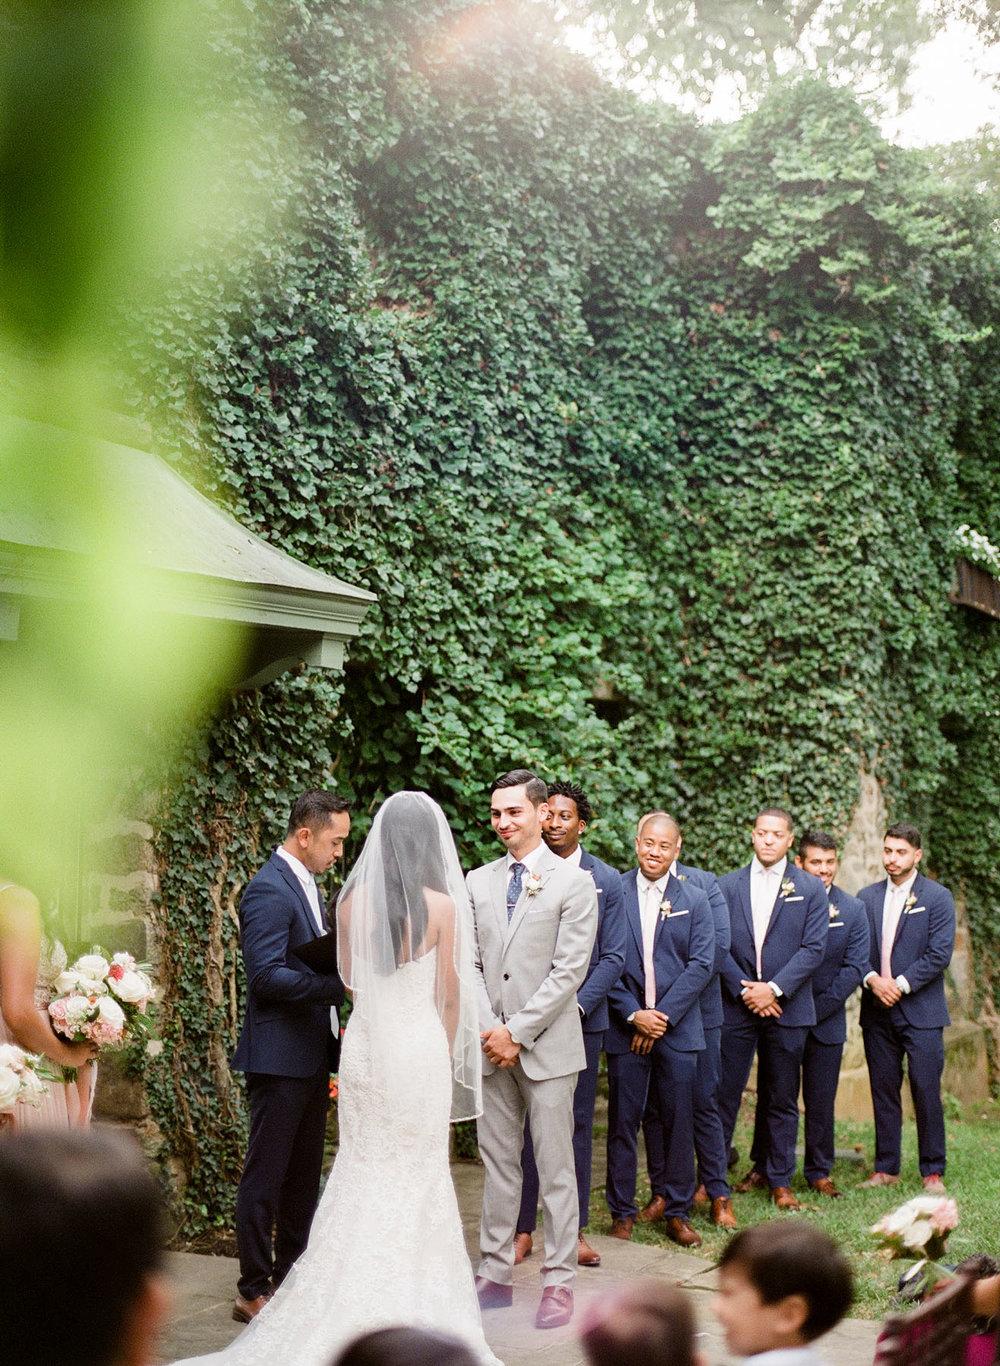 Virginia-Film-Photographer-Wedding-33.jpg